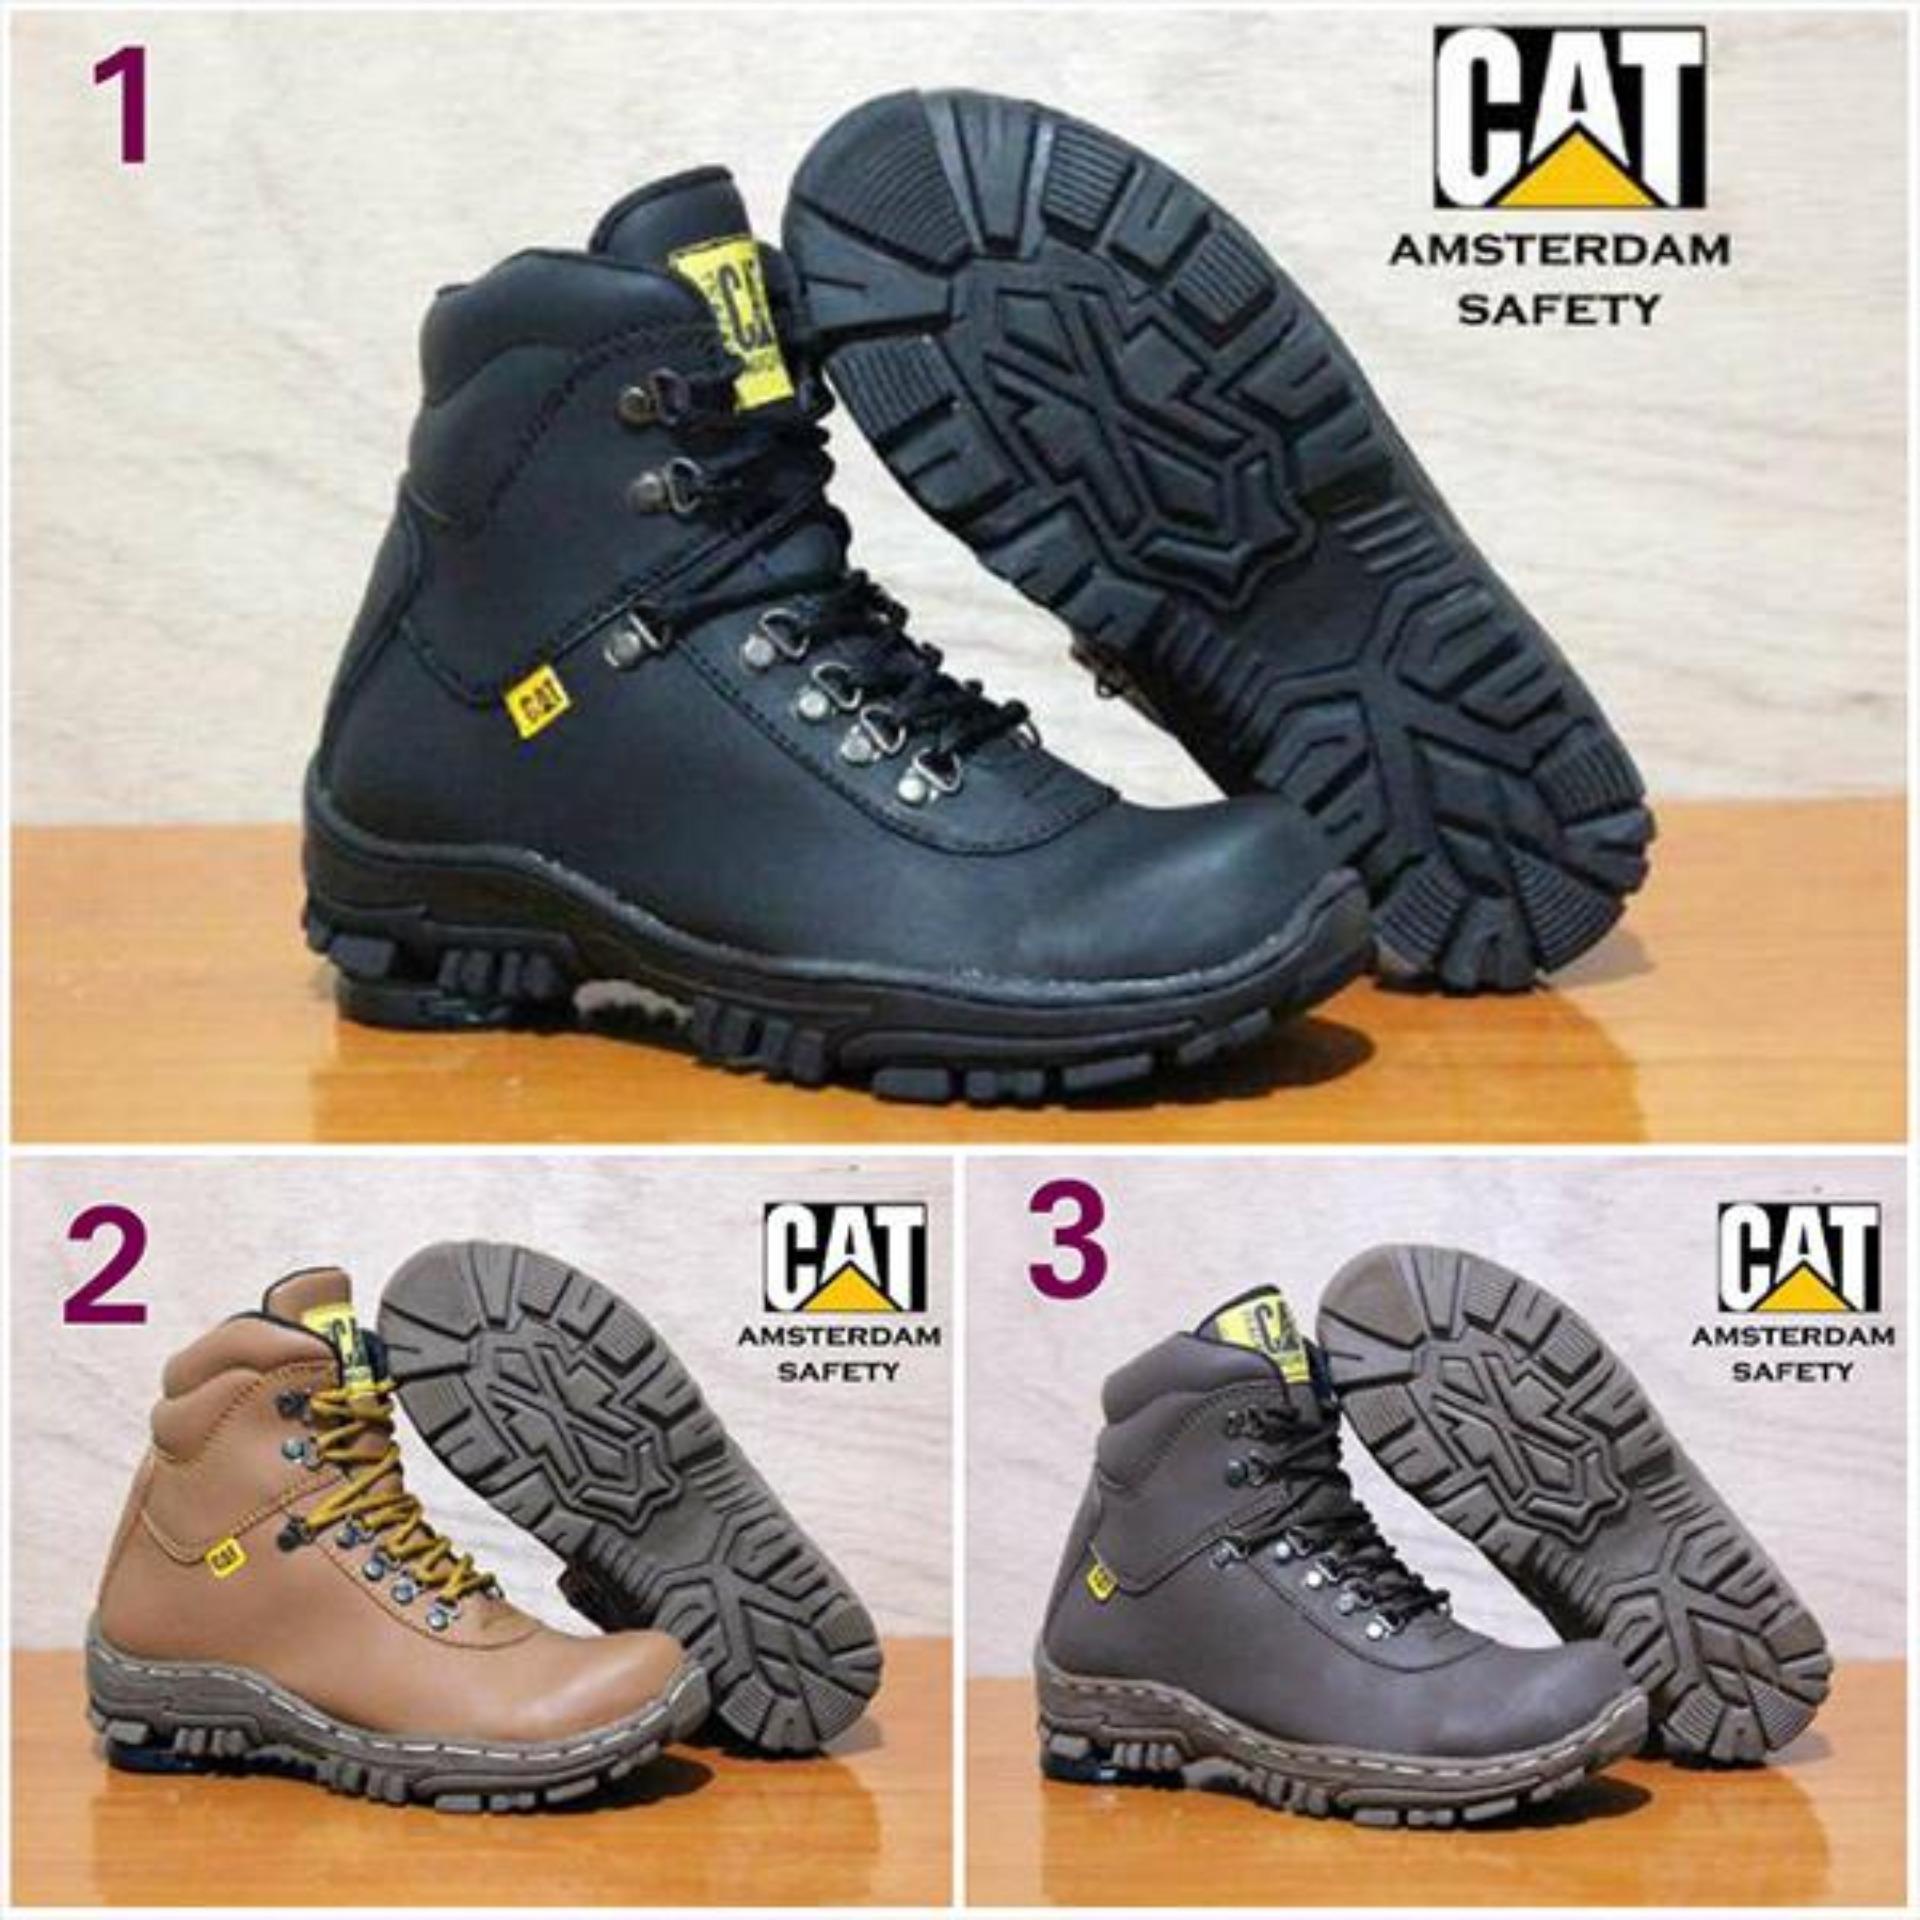 caterpillar amsterdam black.brown.tan sepatu fashion pria safety